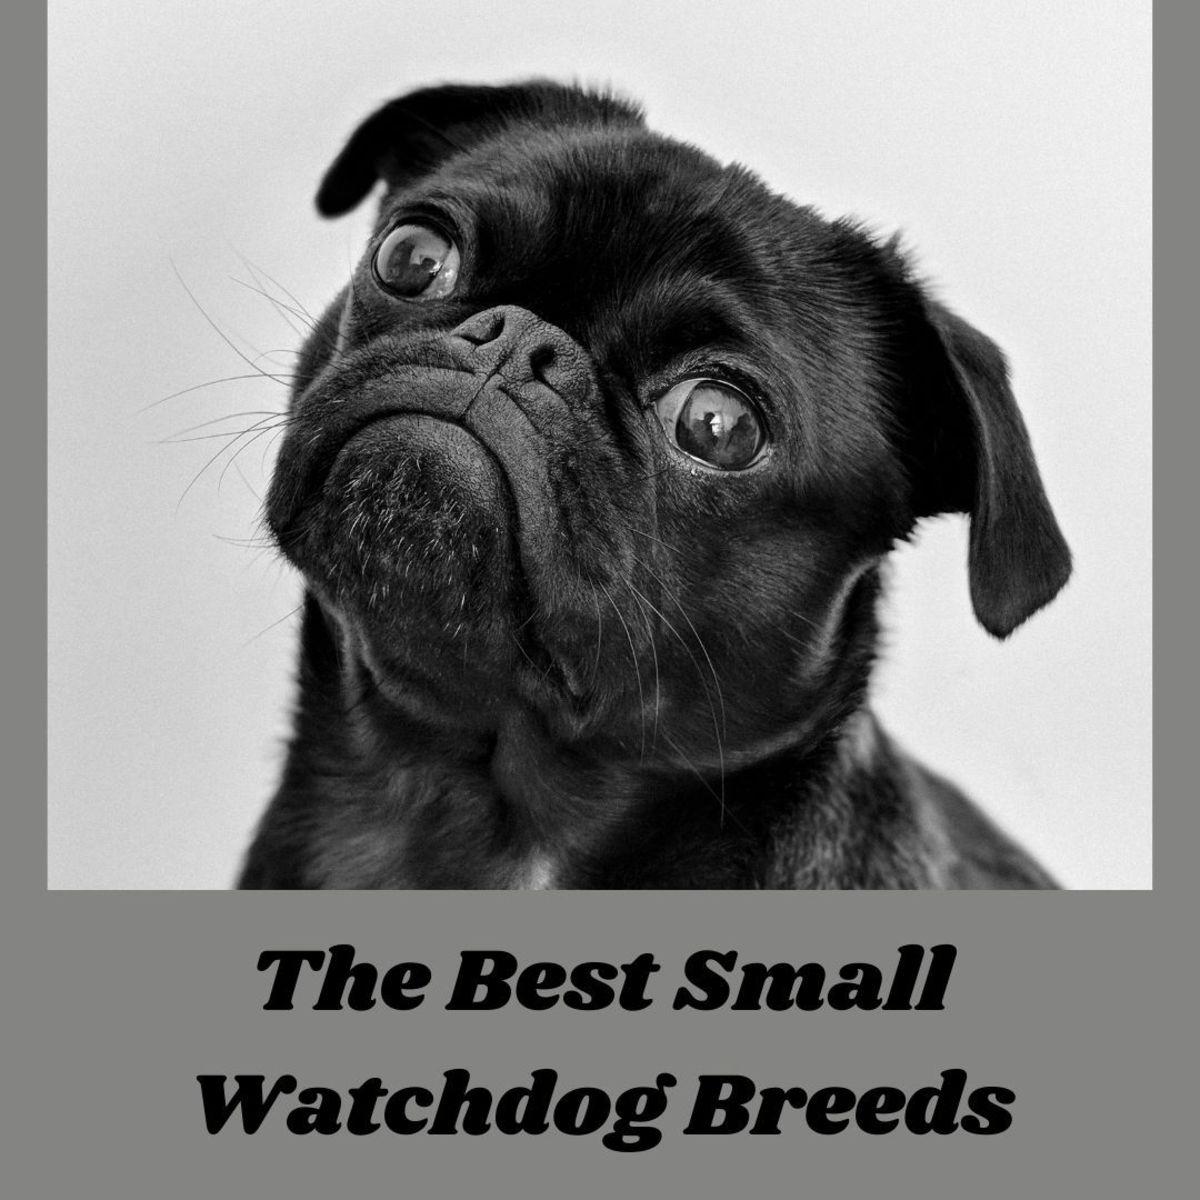 5 Best Small Watchdog Breeds